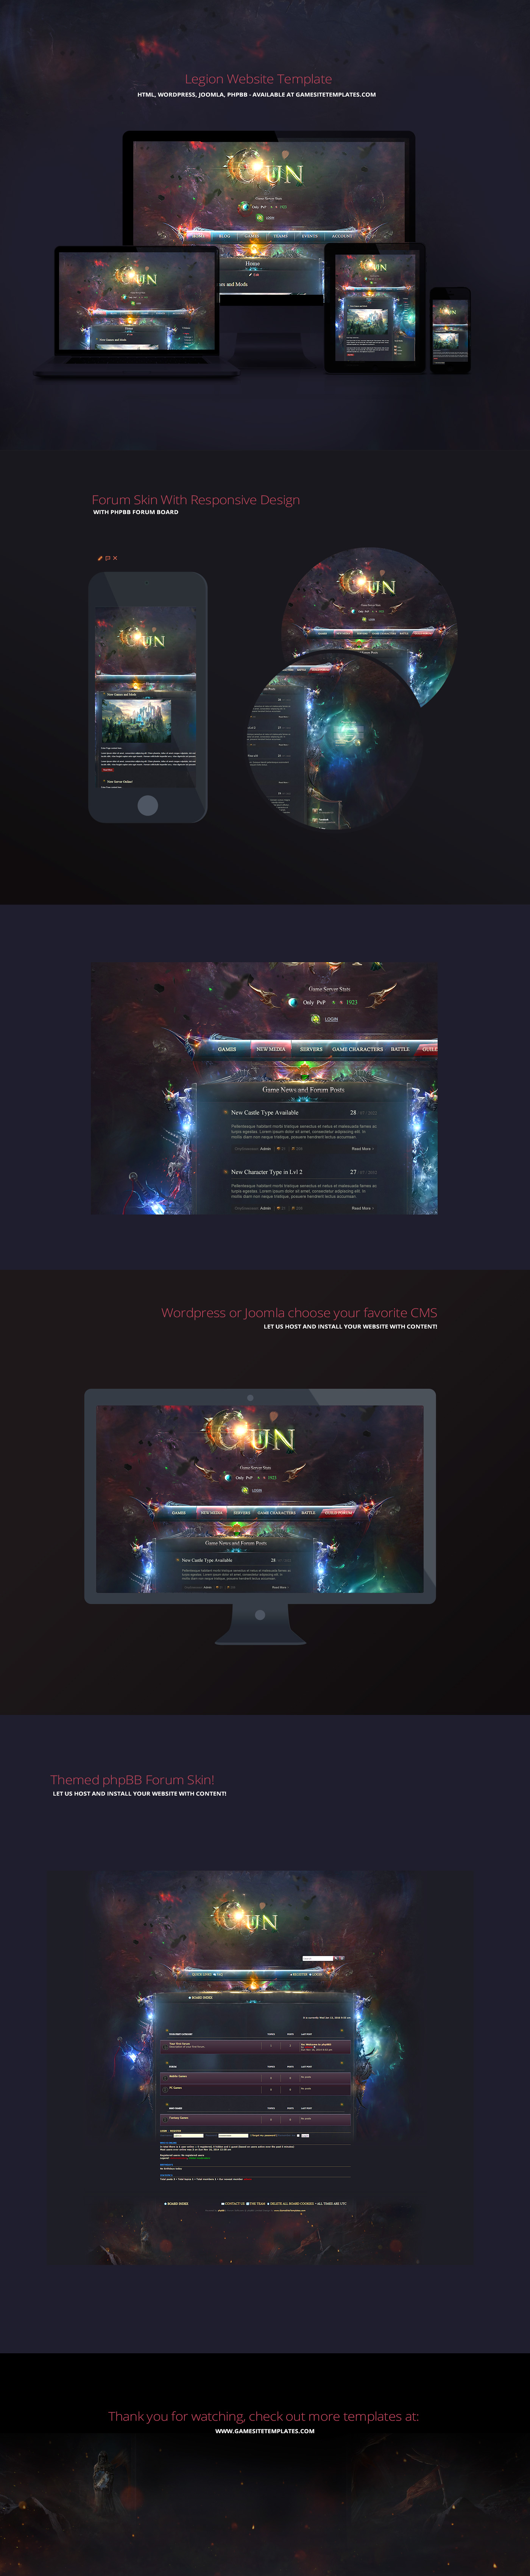 Web Designs on Clan-Templates - DeviantArt